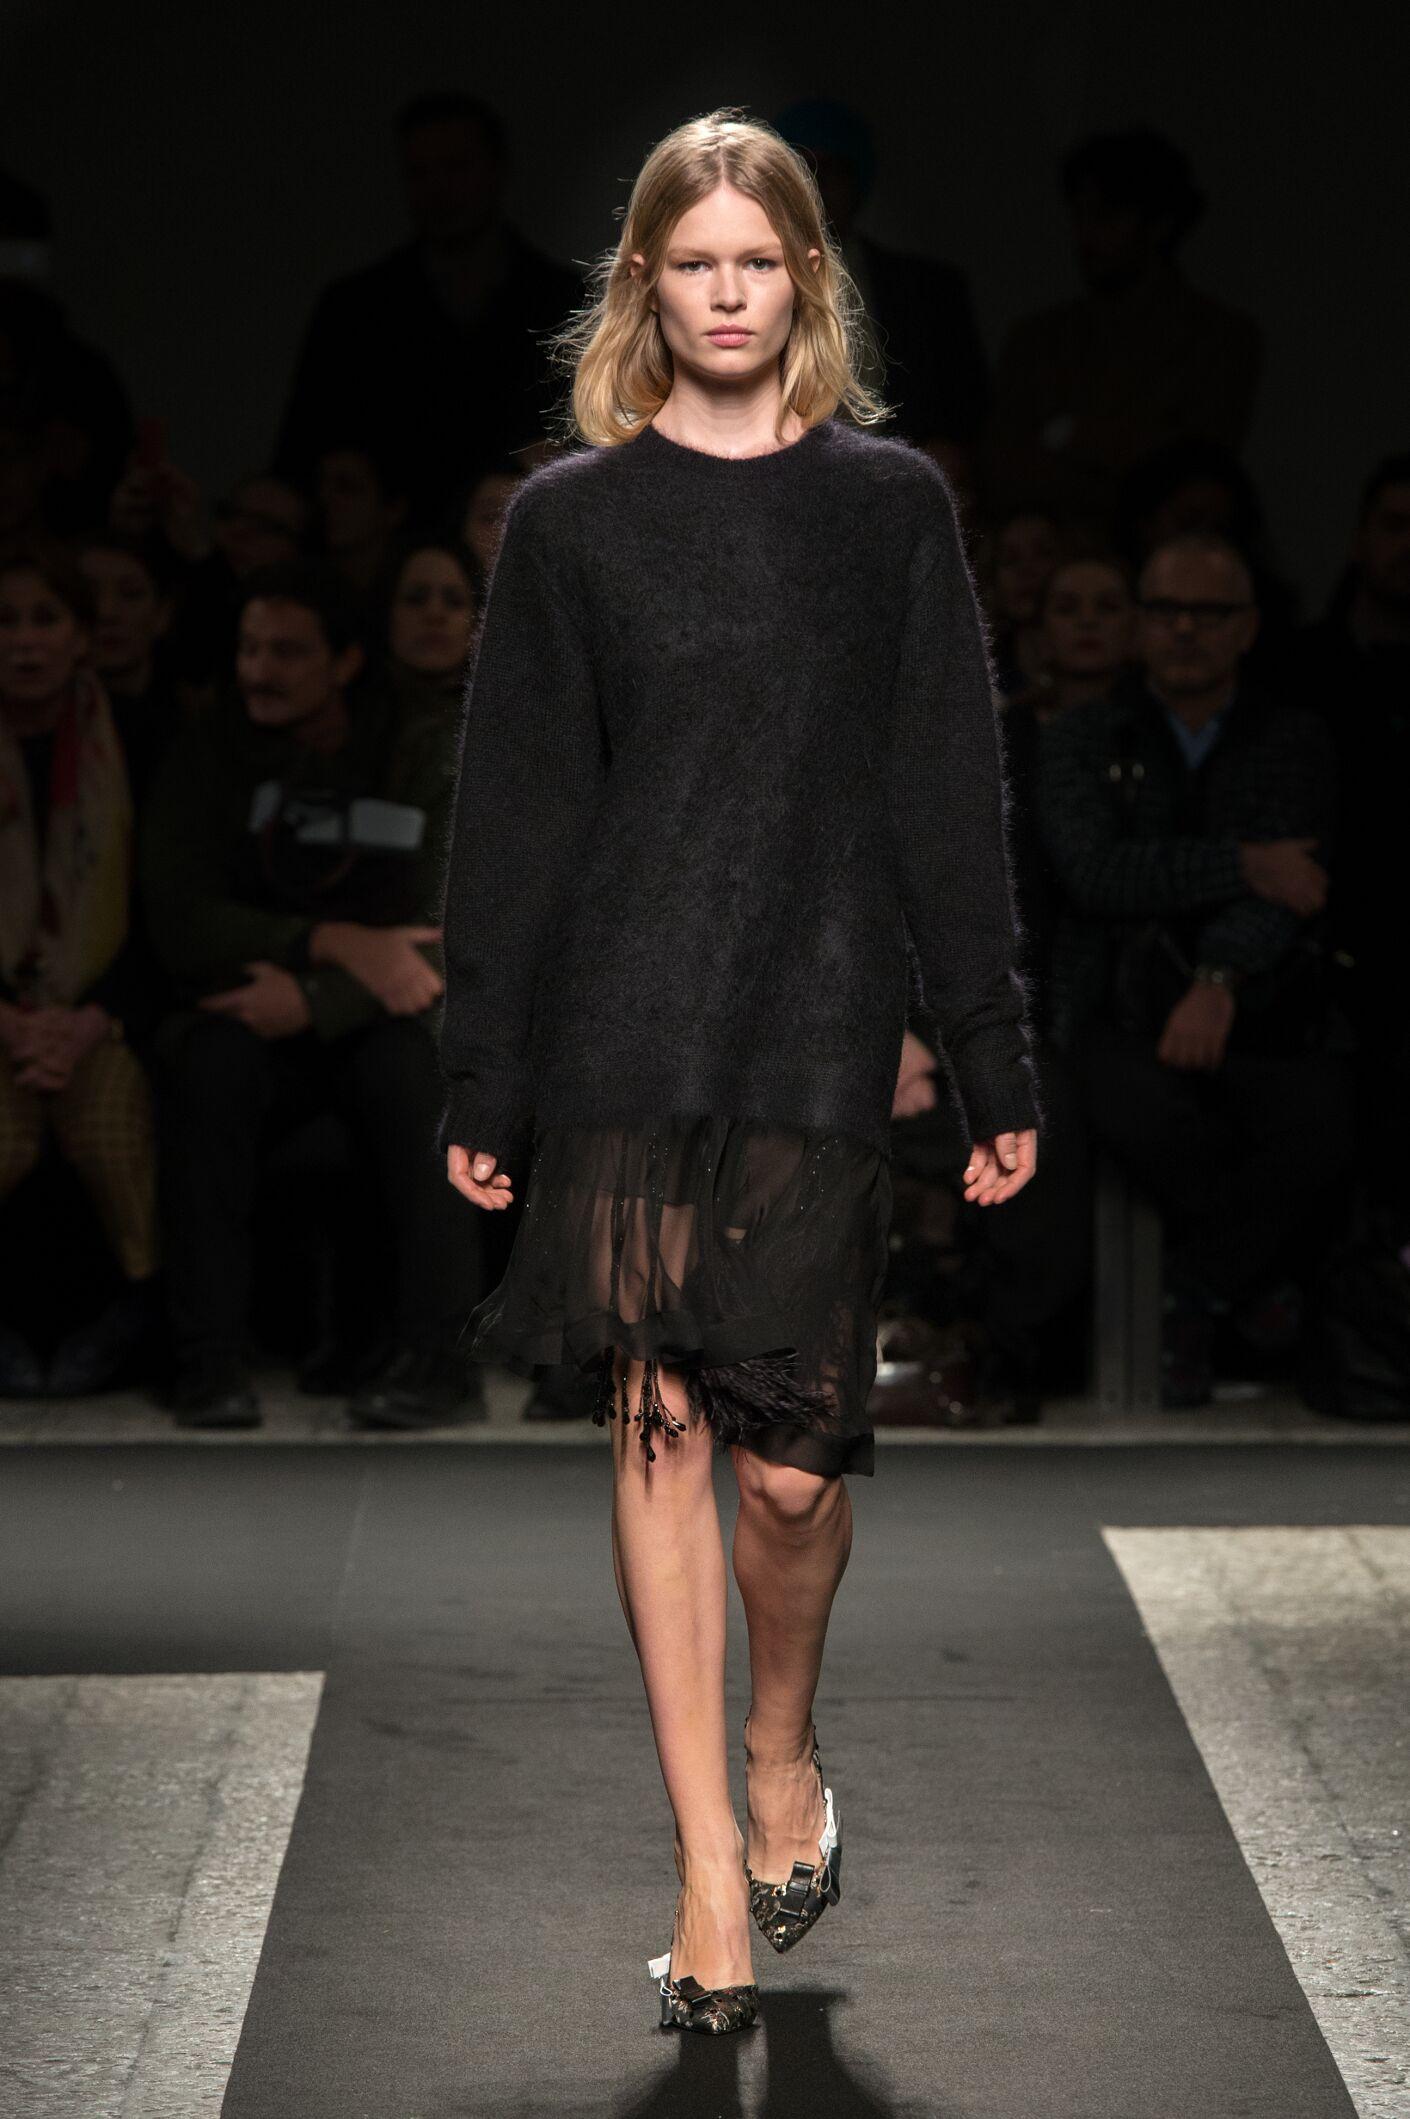 Winter Fashion Trends 2014 2015 N21